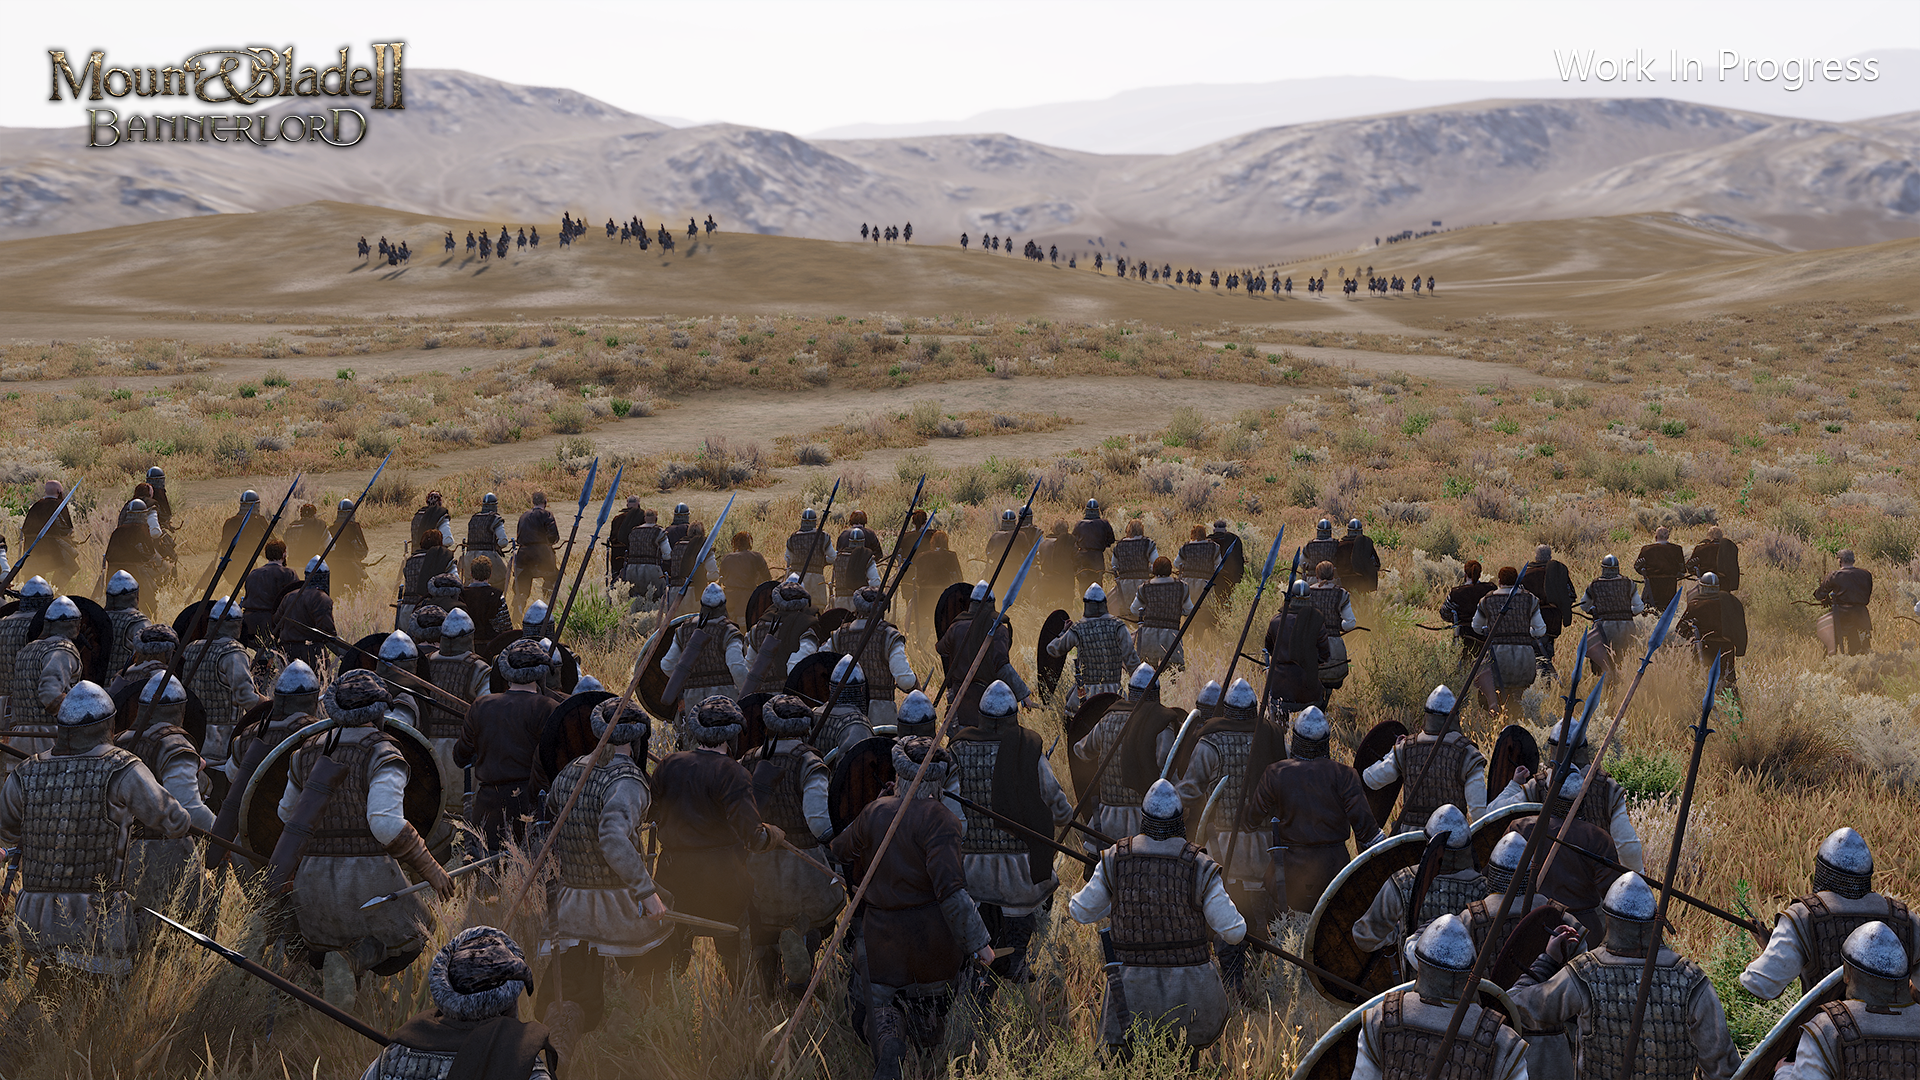 Bannerlord-Gamescom-18-Screenshot05.png